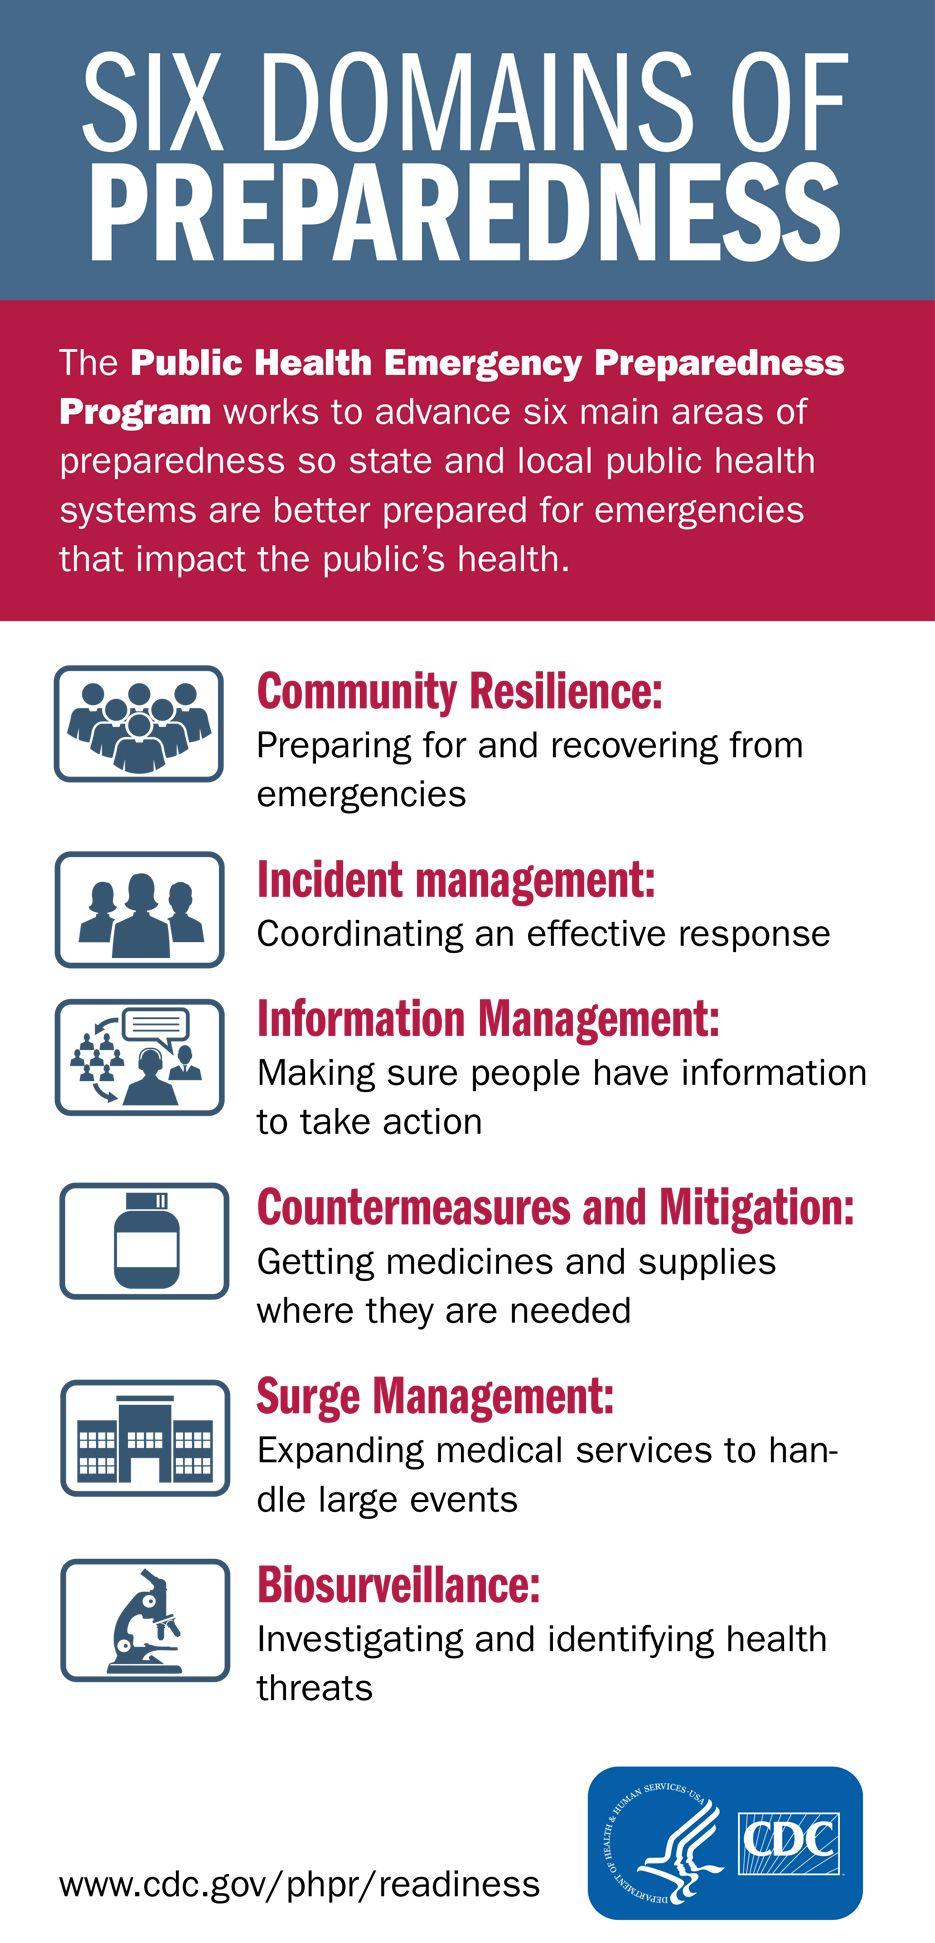 CDC's Public Health Emergency Preparedness Program Every